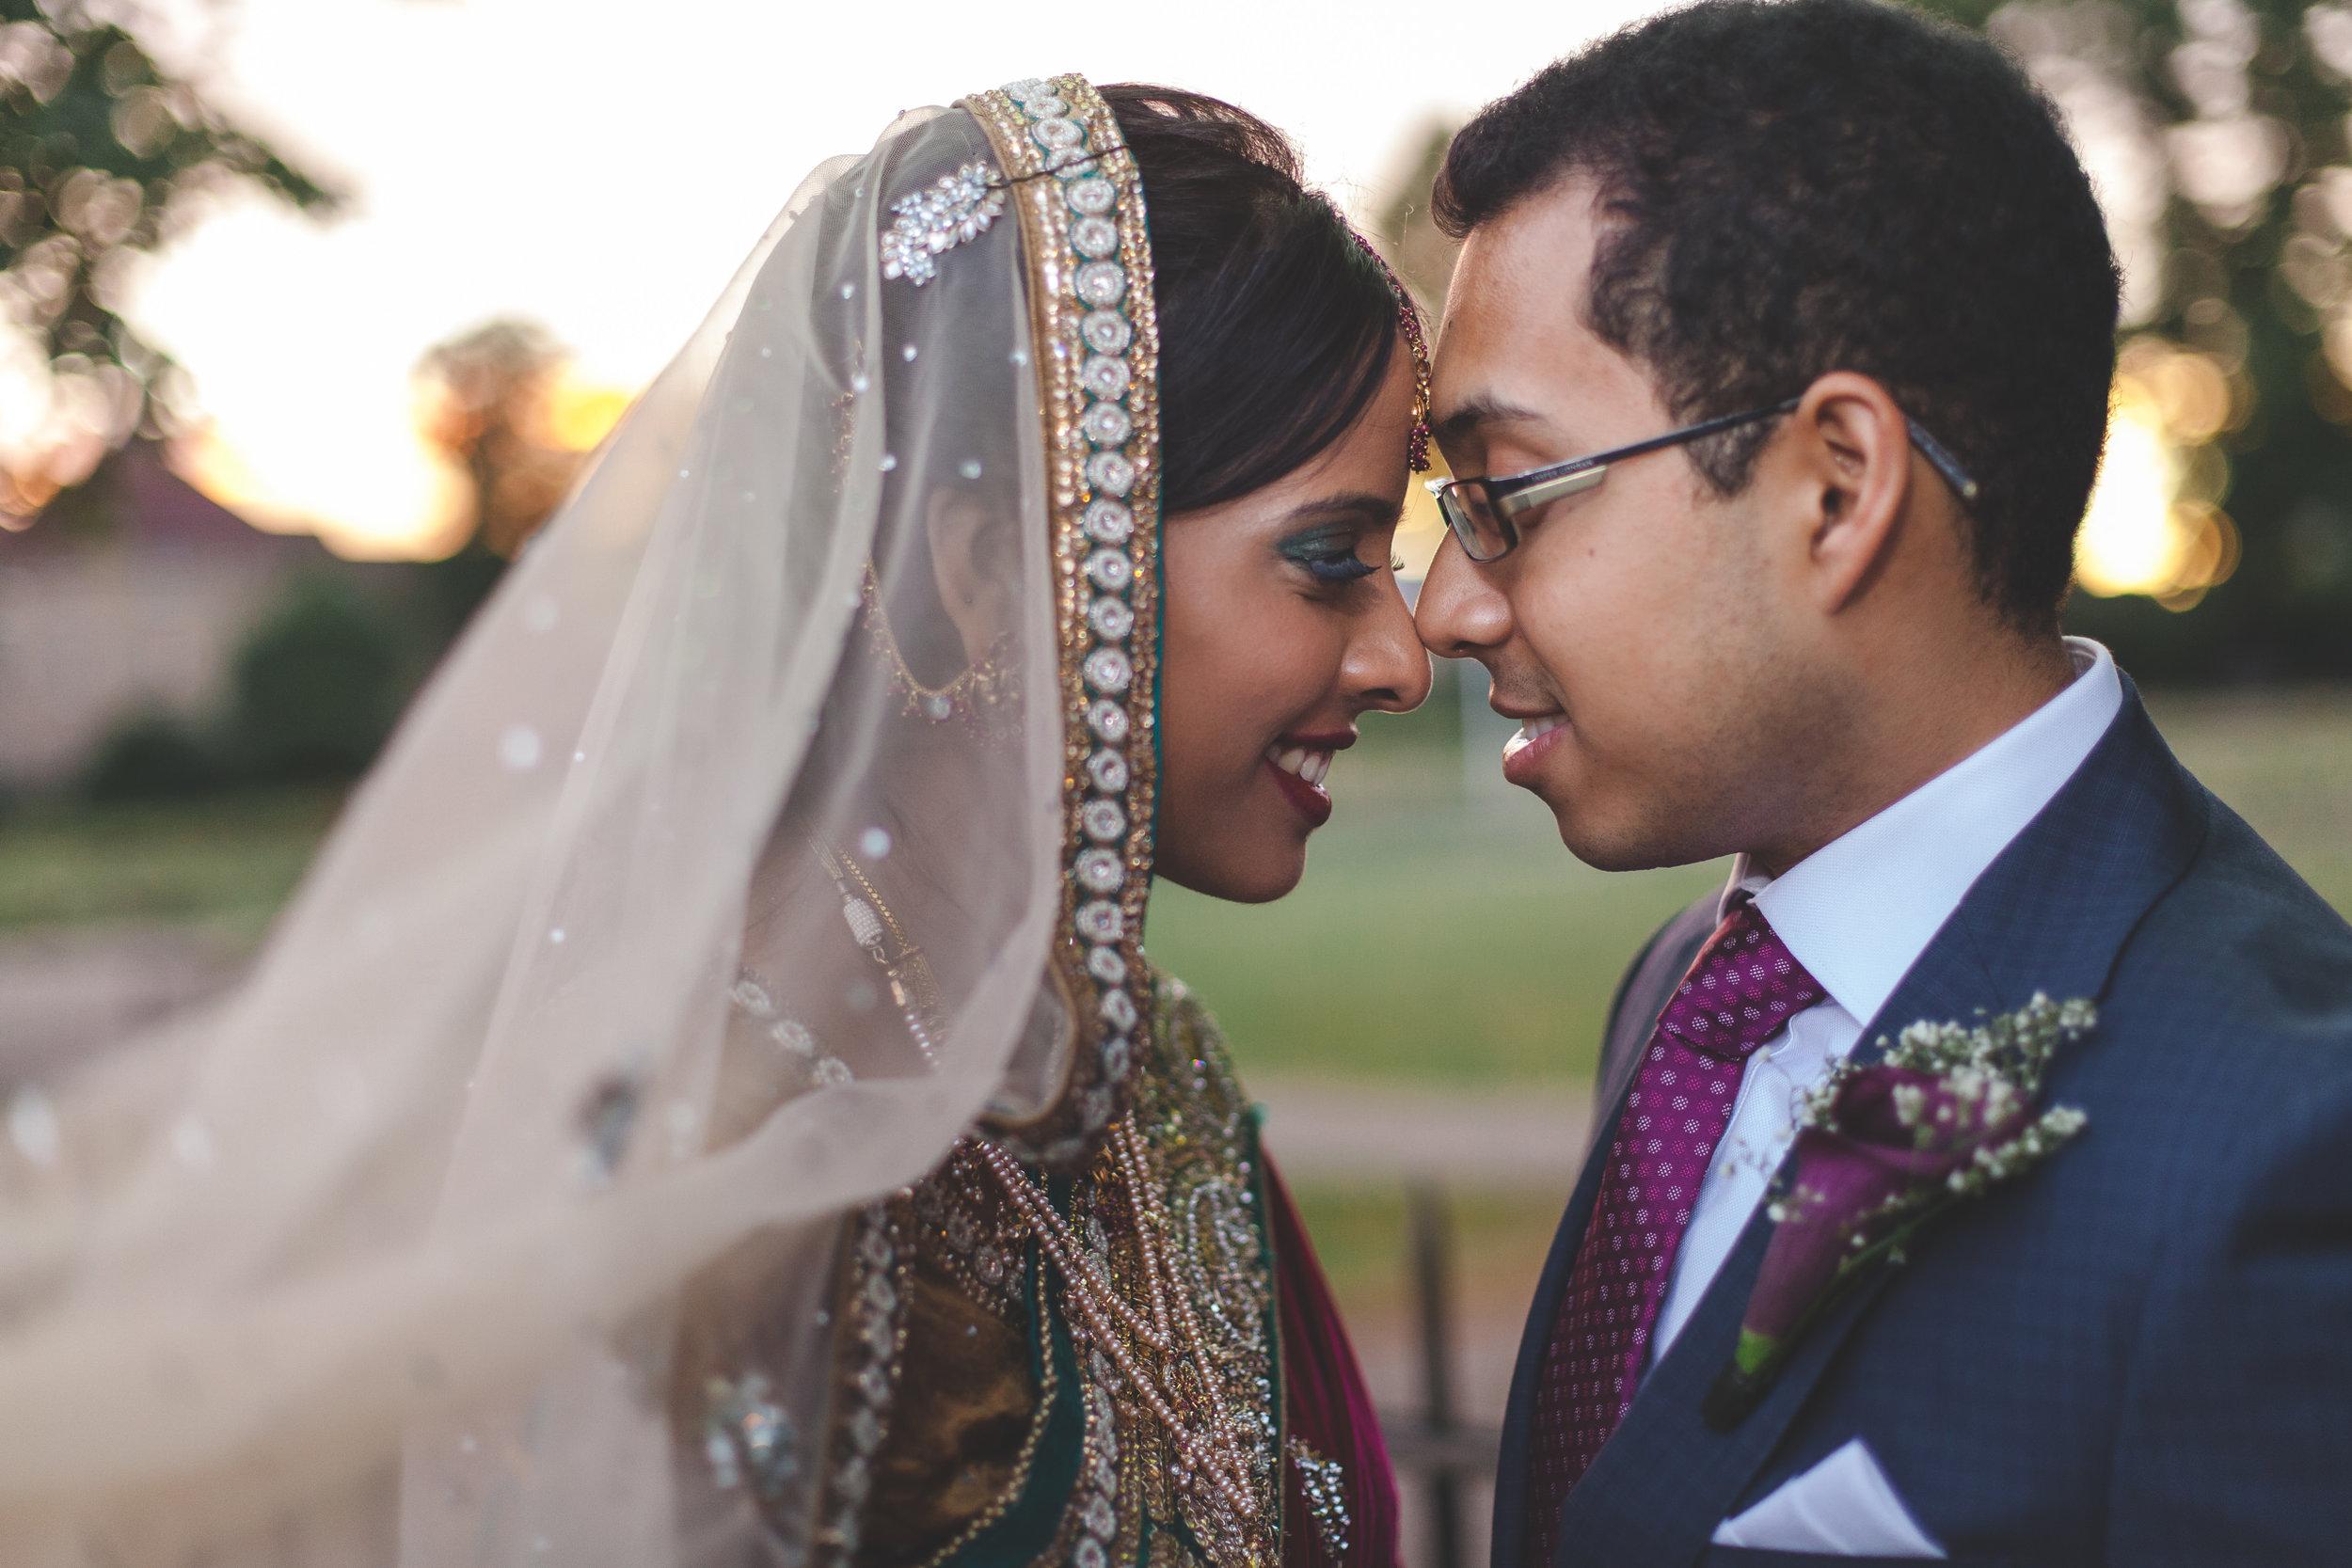 london-wedding-photographer-home-0001.jpg